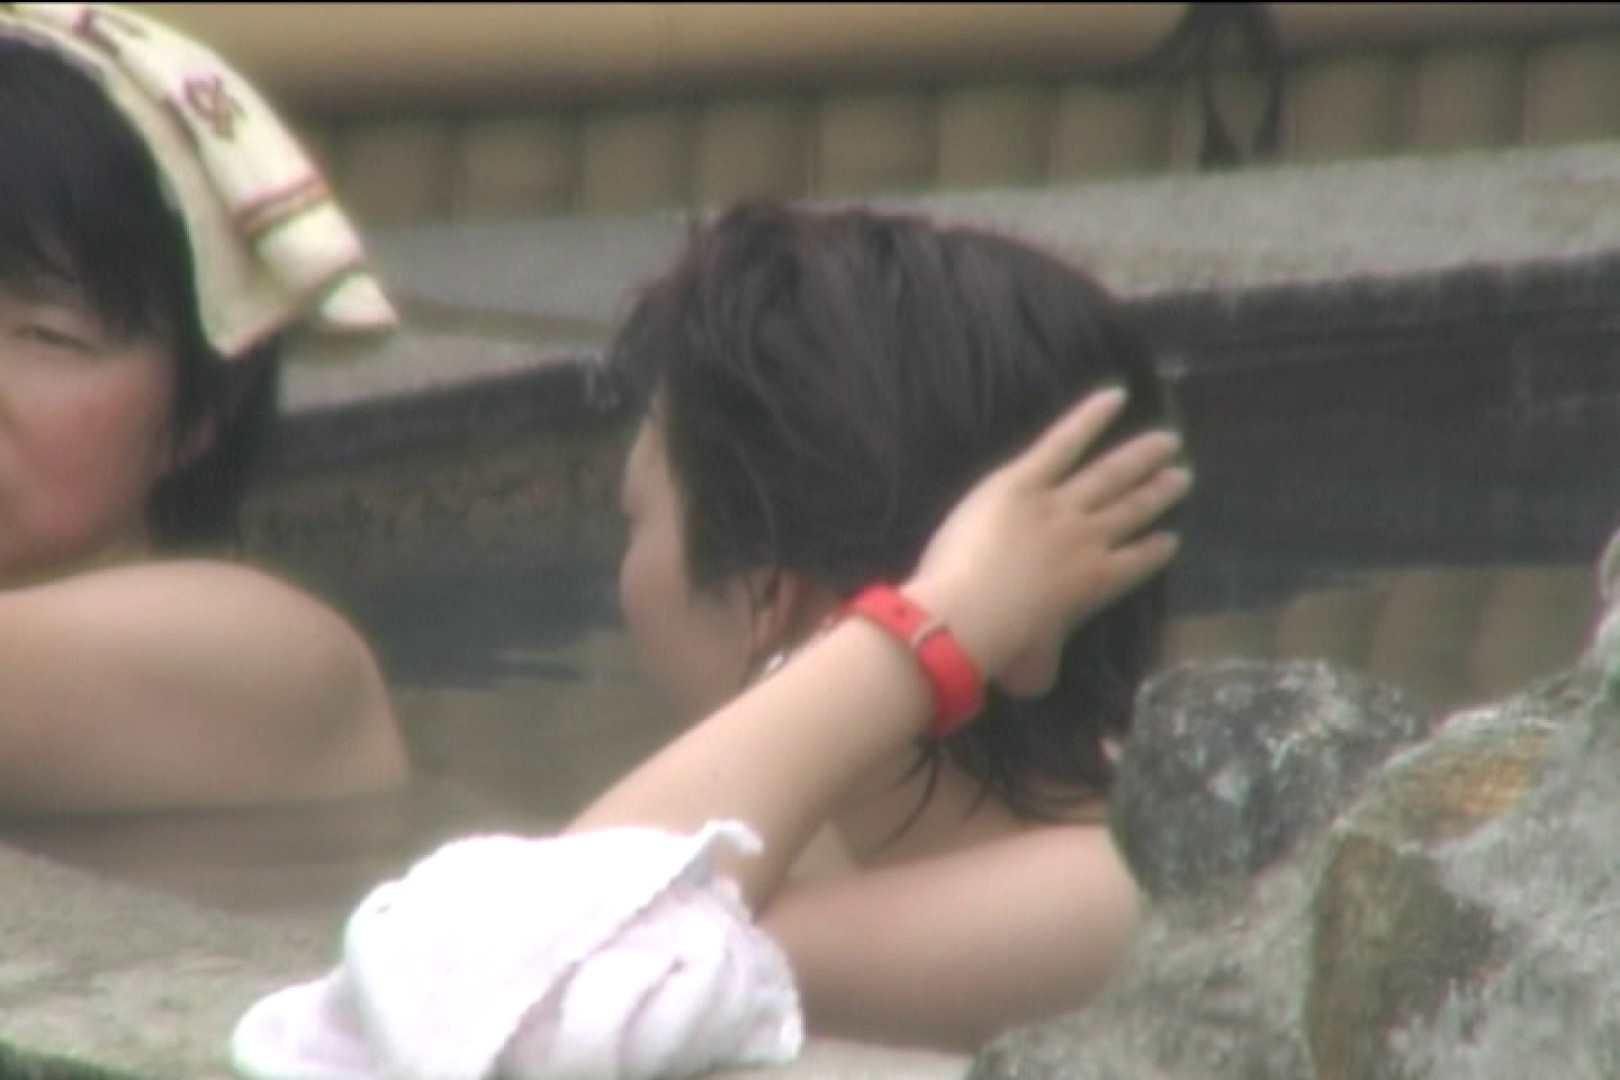 Aquaな露天風呂Vol.122 エッチな盗撮 オメコ無修正動画無料 107pic 94